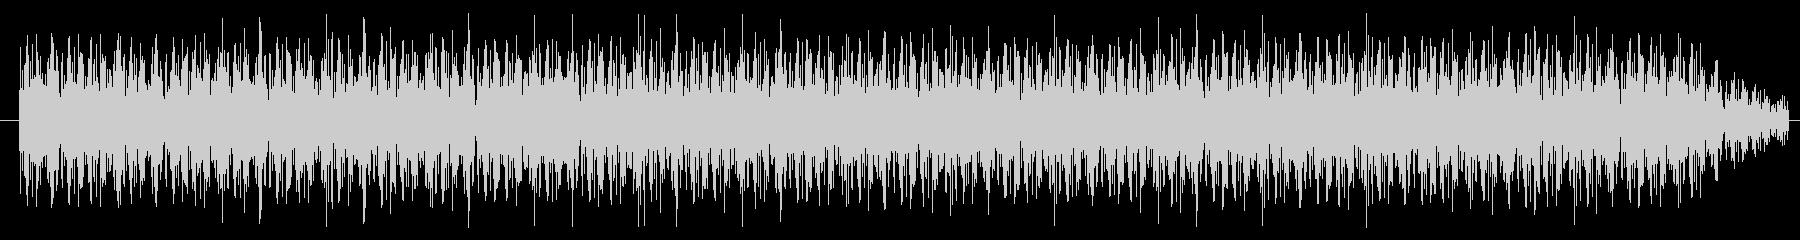 SNES-RPG03-9(崩壊) の未再生の波形